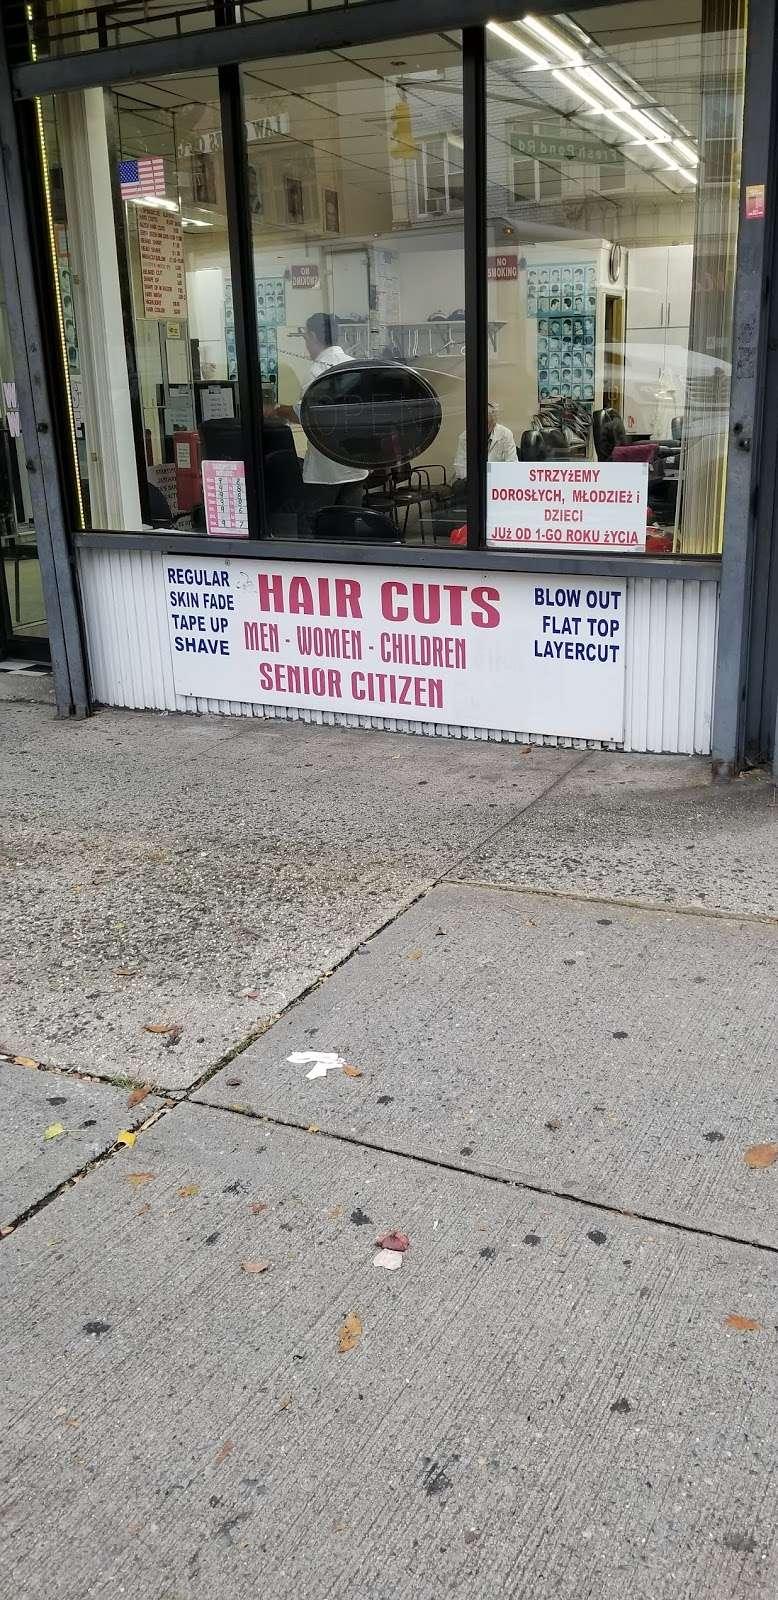 Marks Barber Shop & Beauty Salon - hair care  | Photo 6 of 6 | Address: 68-68 Fresh Pond Rd, Ridgewood, NY 11385, USA